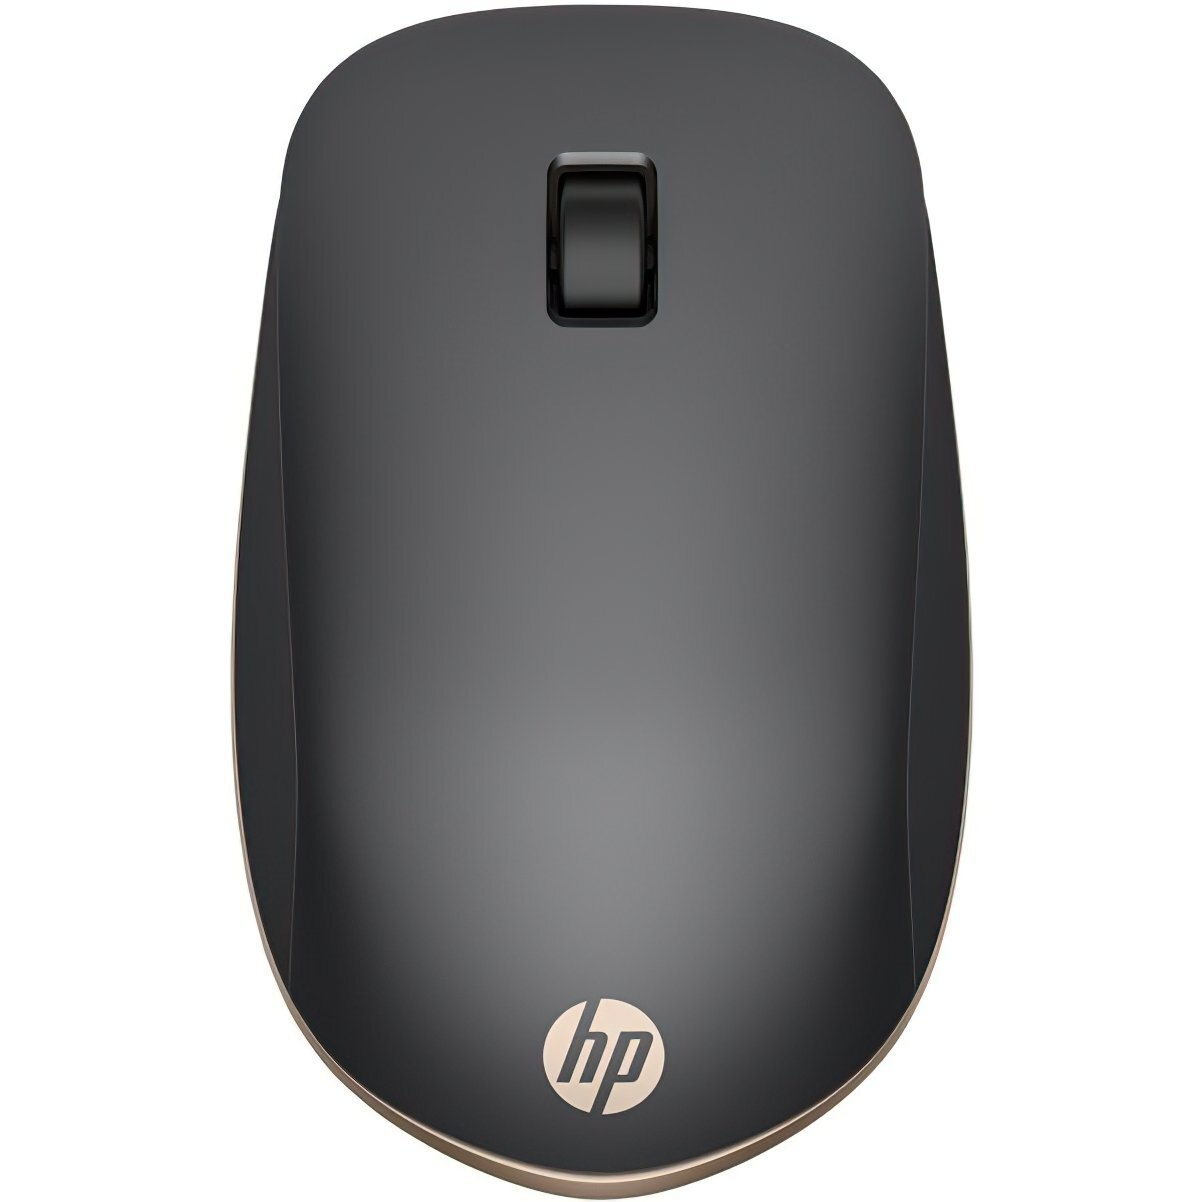 Мышь HP Z5000 Bluetooth Black (W2Q00AA) фото